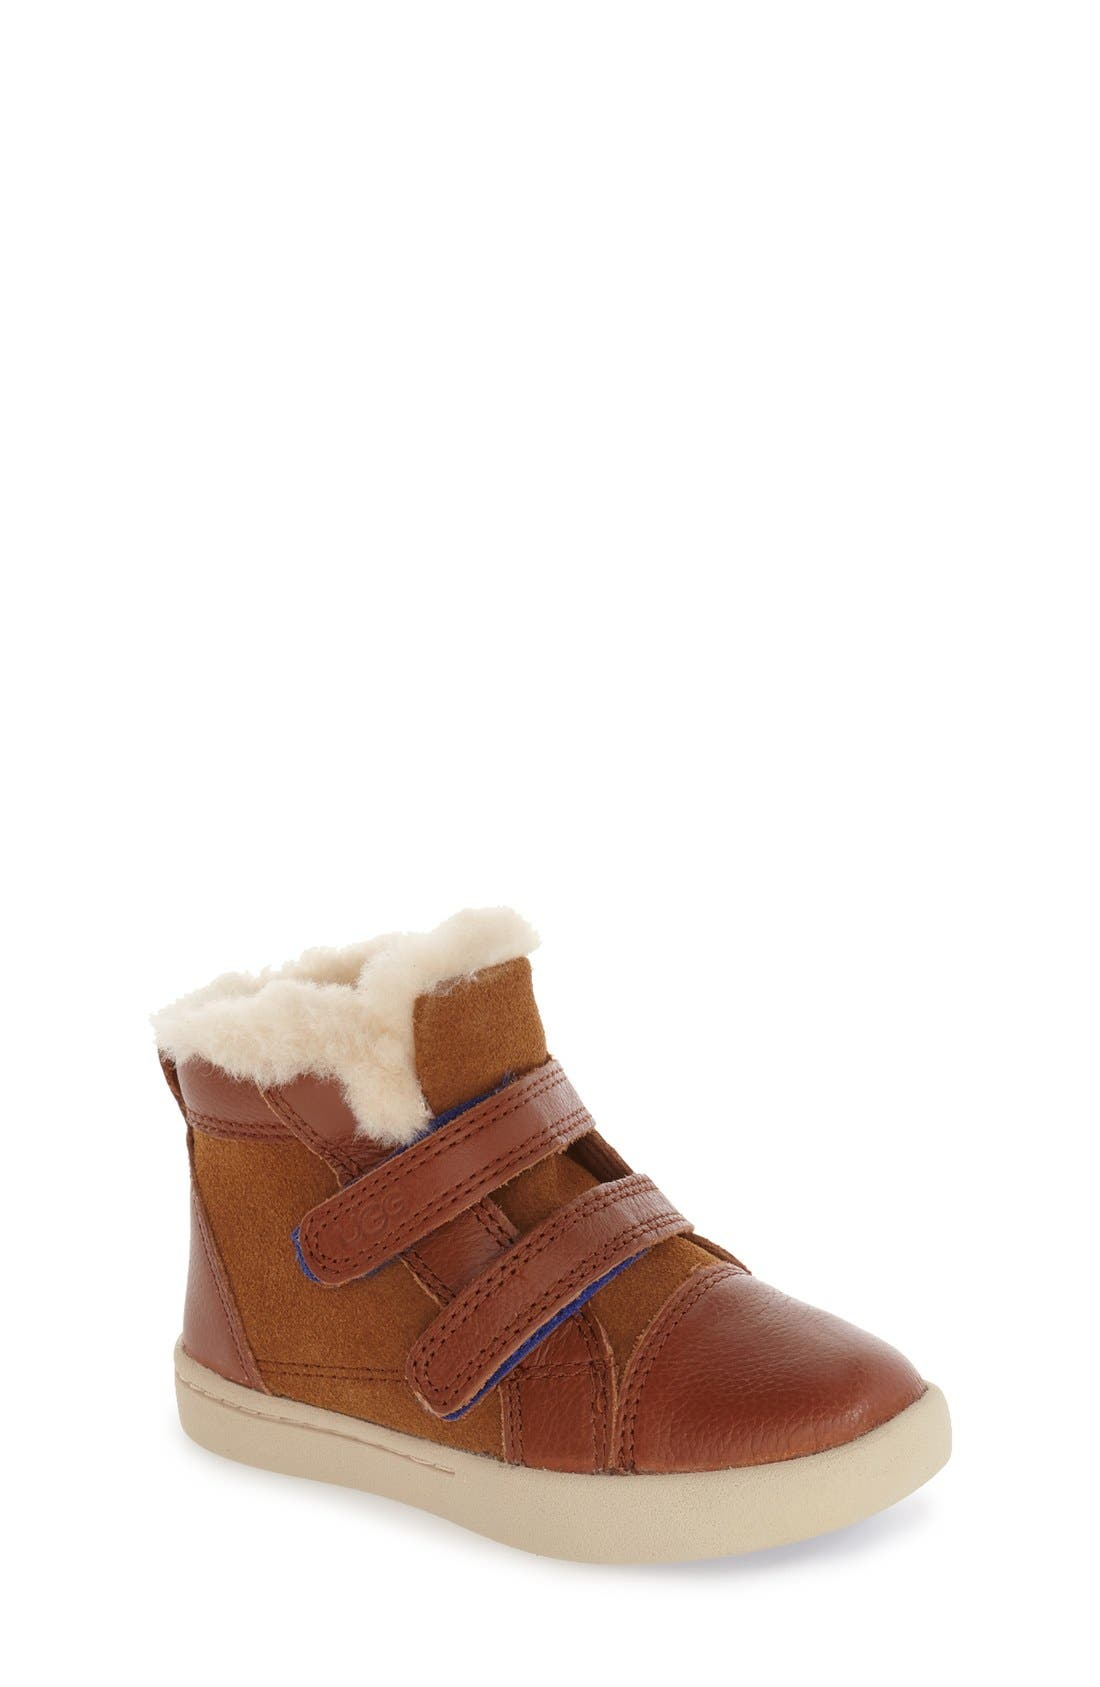 Rennon High Top Sneaker,                             Main thumbnail 1, color,                             Chestnut